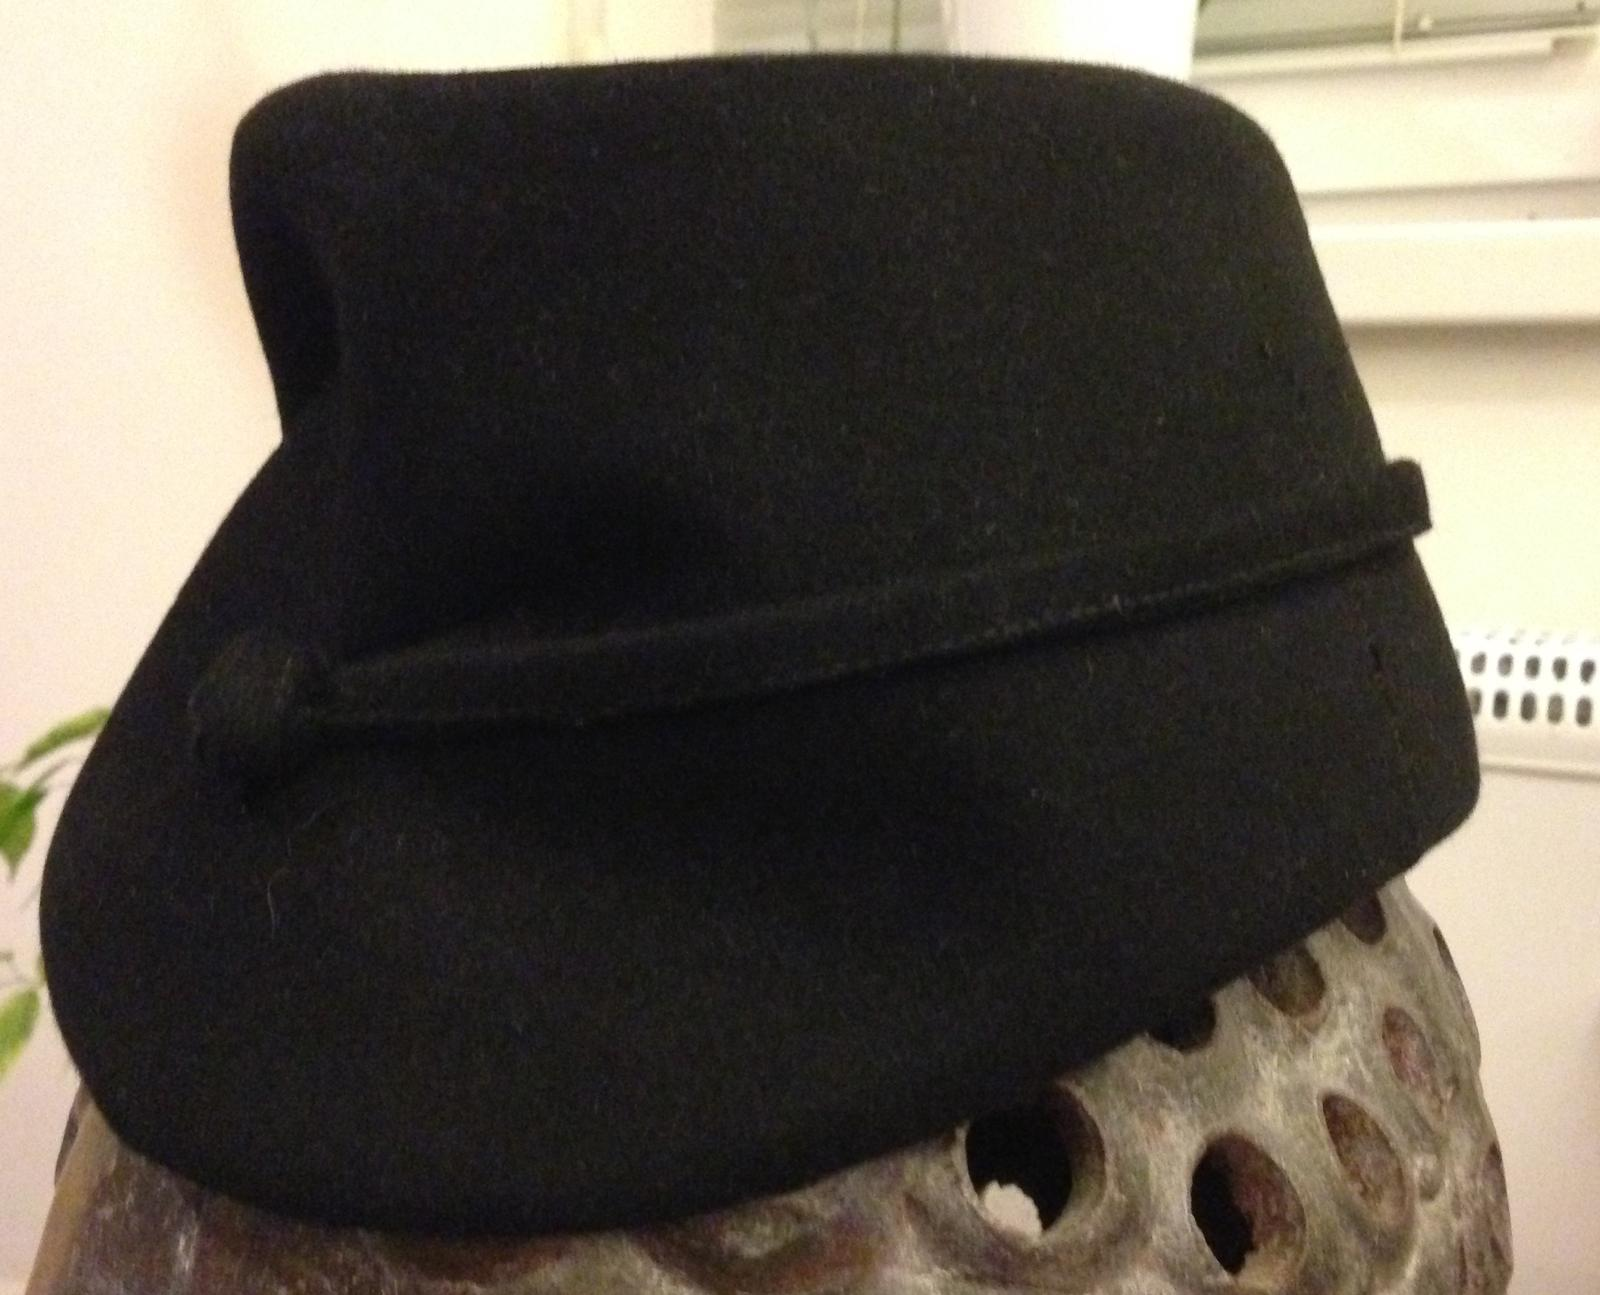 6c55c7a78a9f Originál handmade klobúk z klobučníctva